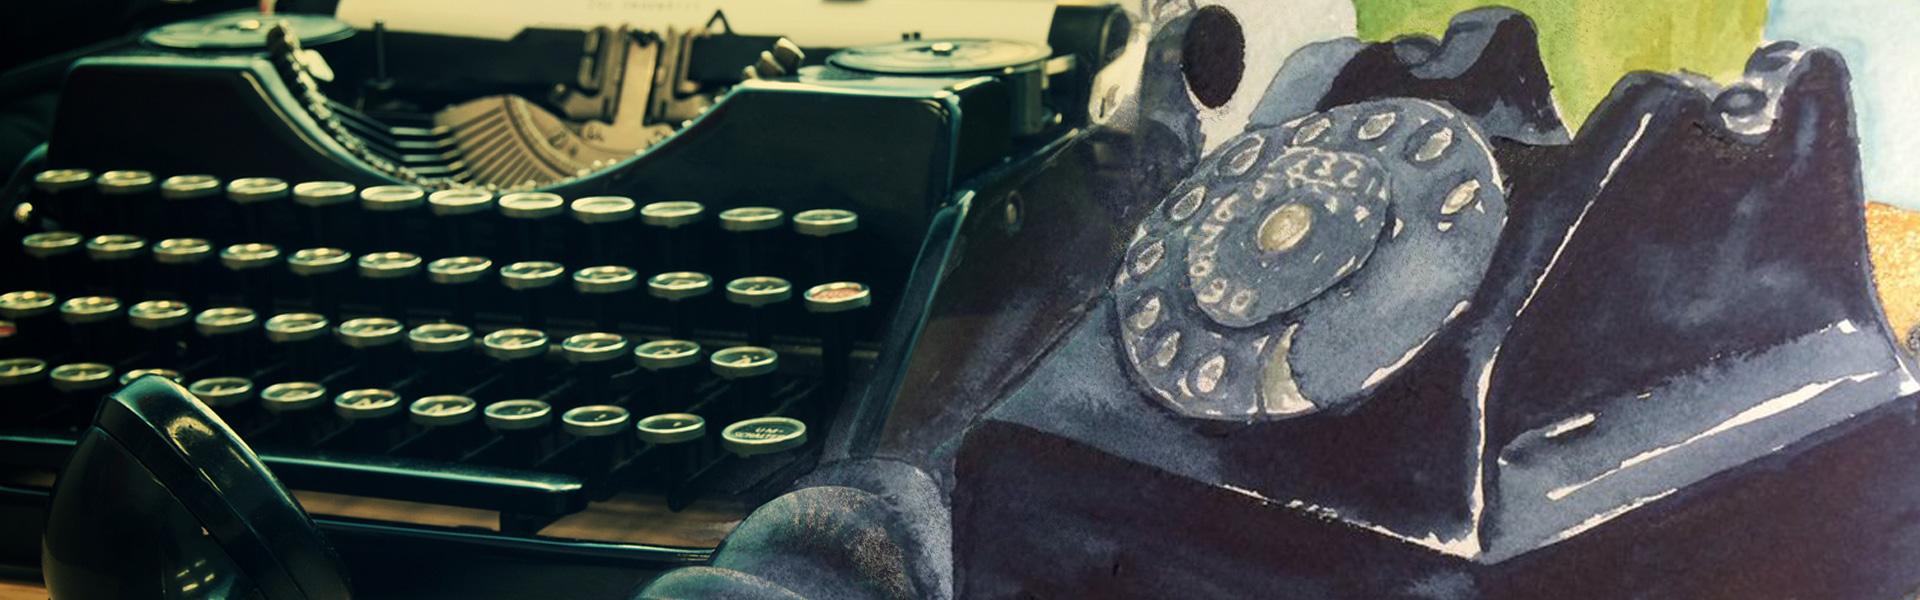 Your Typewriter and Telephone Live Sketches #SketchOff #MakeAStartInArt